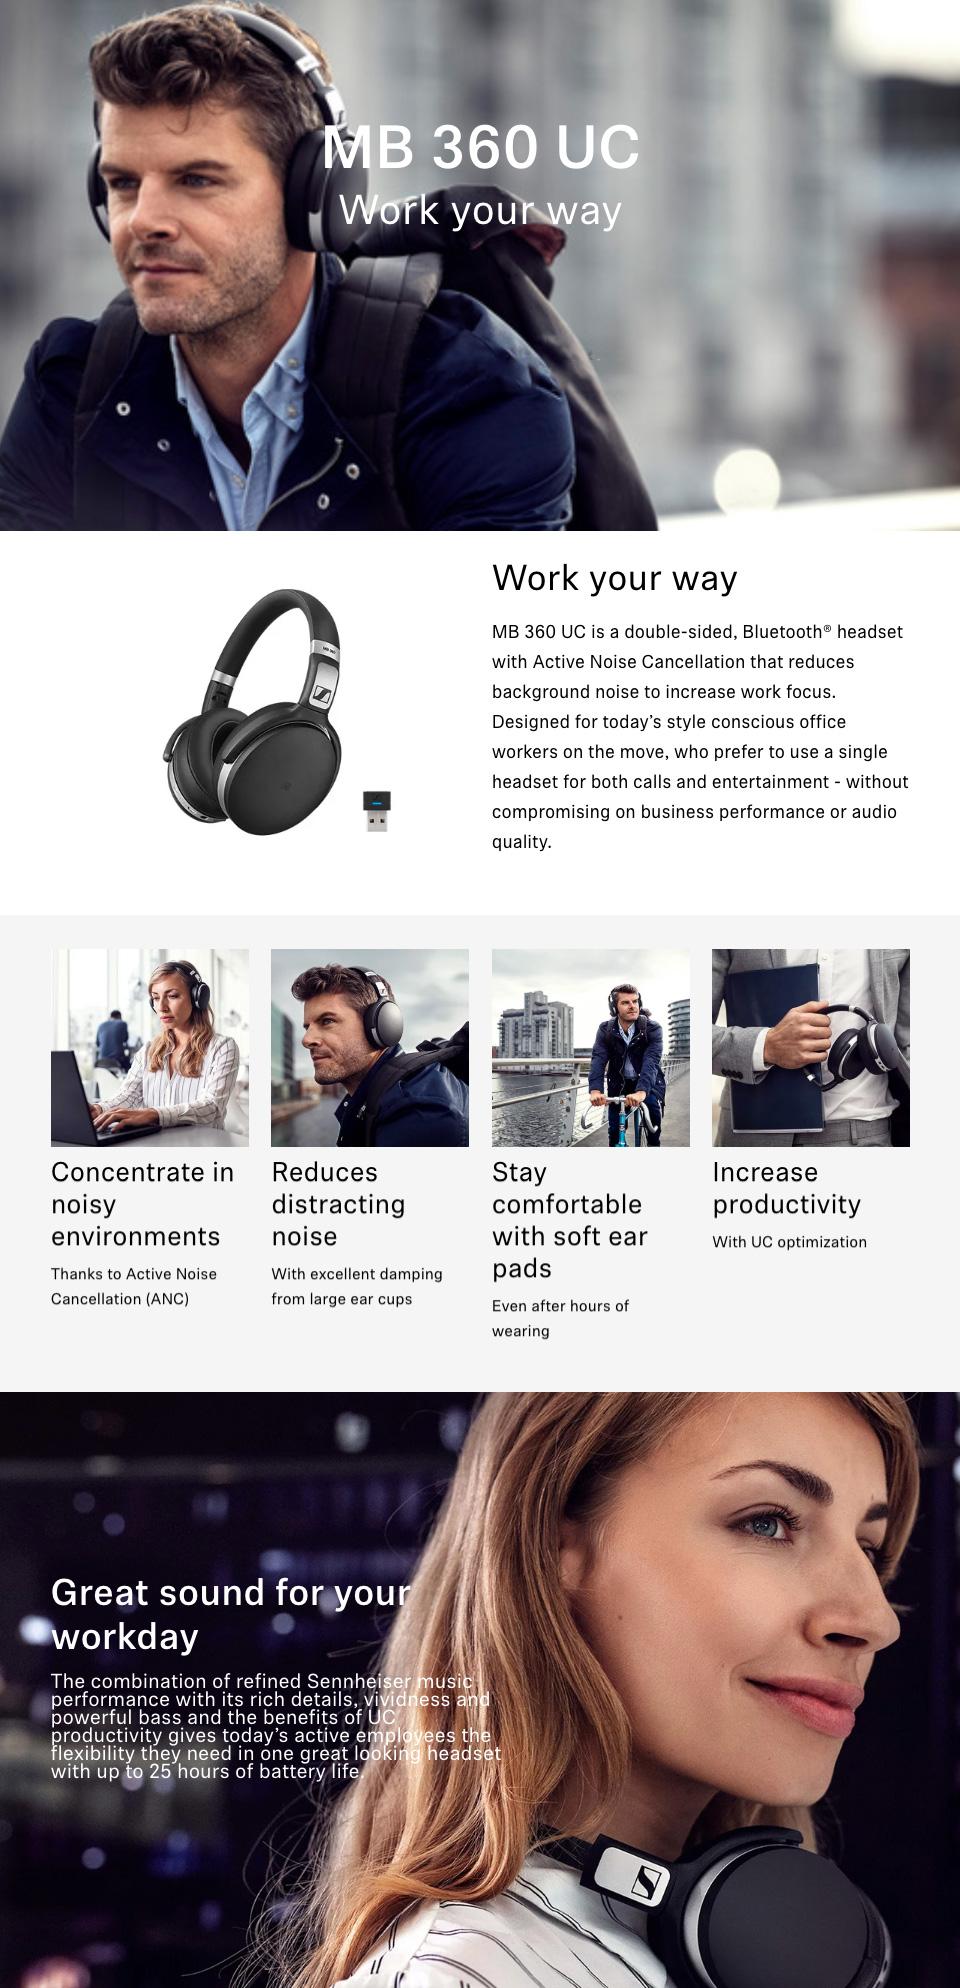 Sennheiser MB 360 UC Bluetooth Headset features